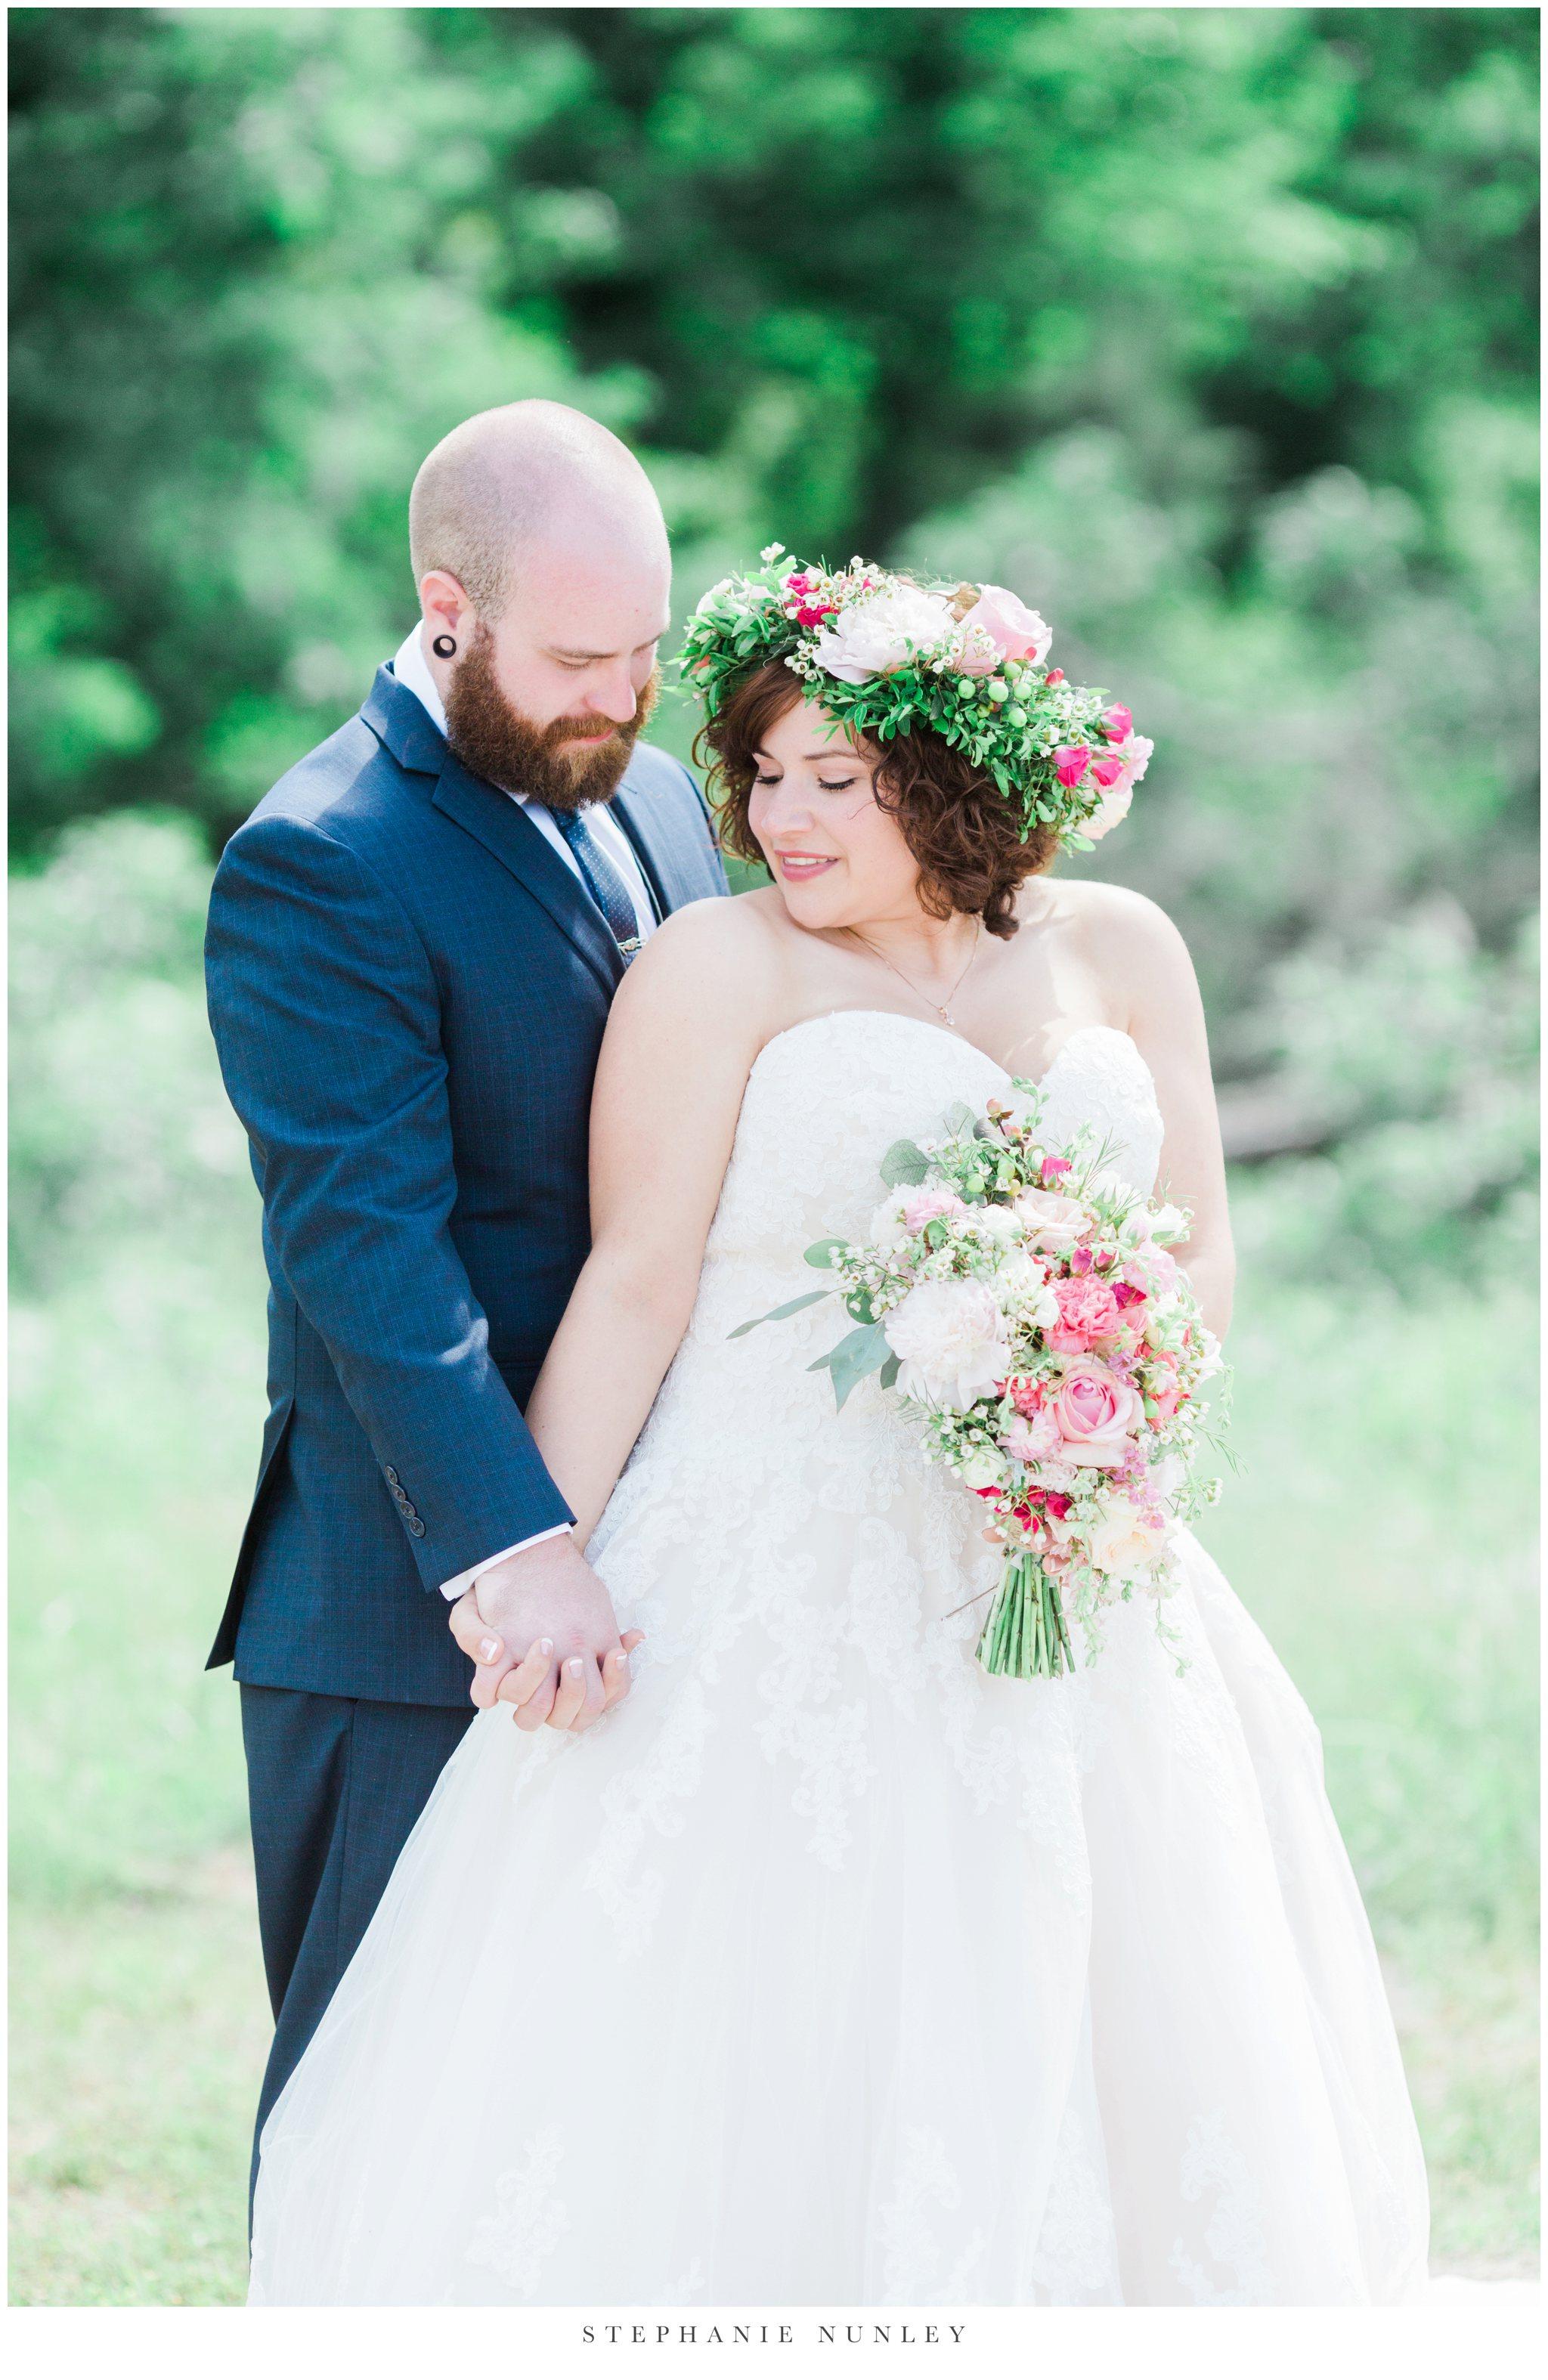 romantic-outdoor-wedding-with-flower-crown-0040.jpg